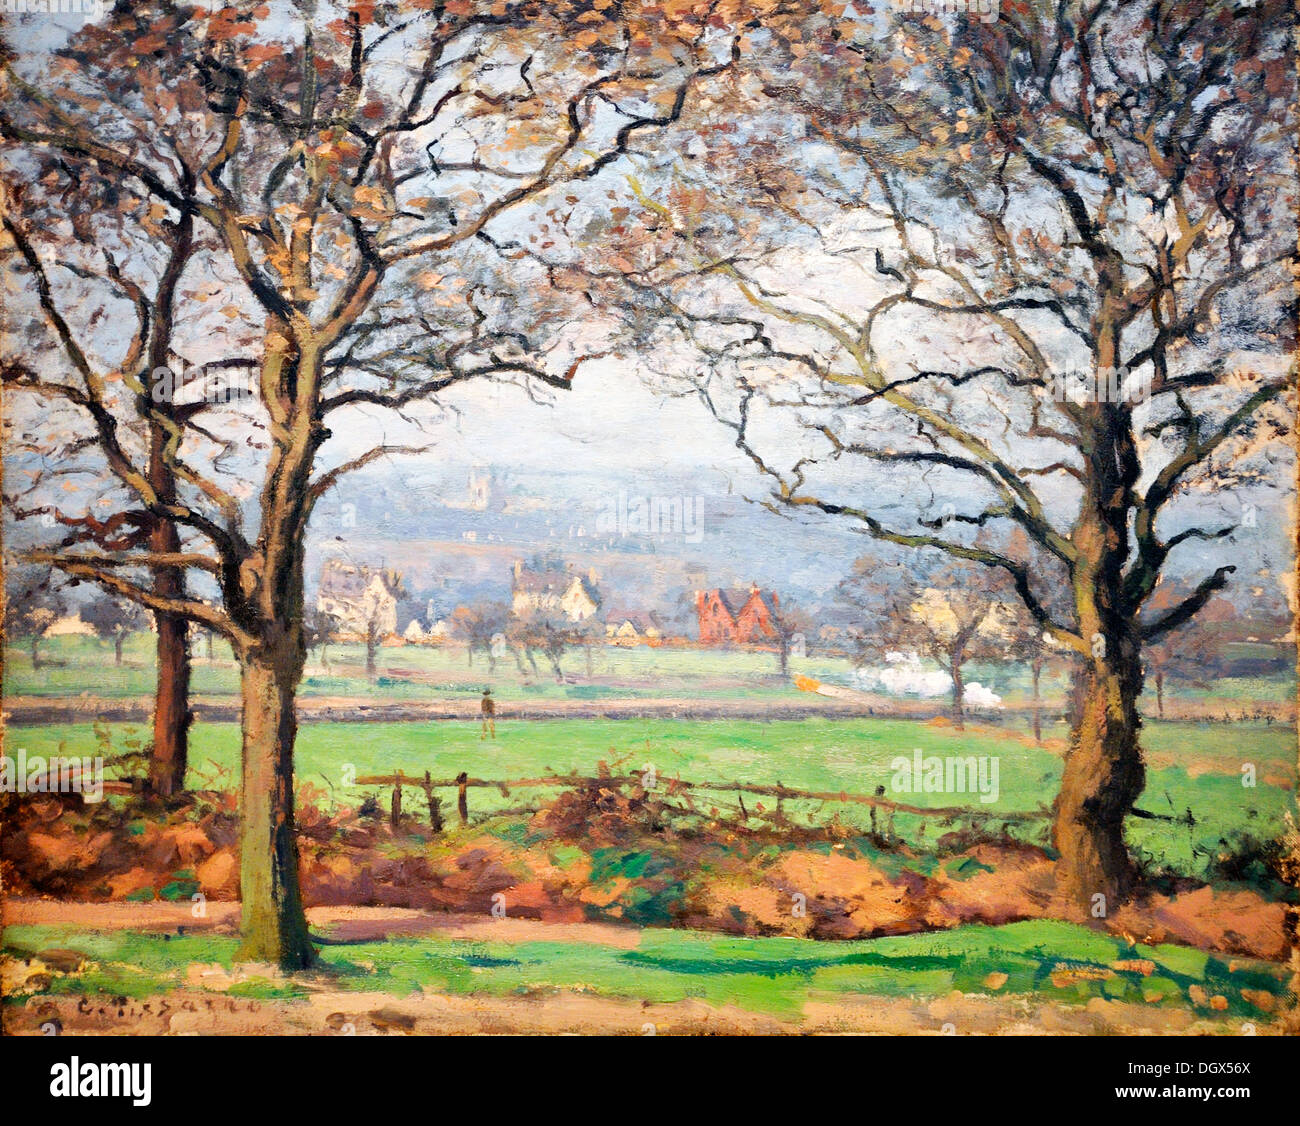 Near Sydenham Hill  - by Camille Pissarro, 1871 - Stock Image